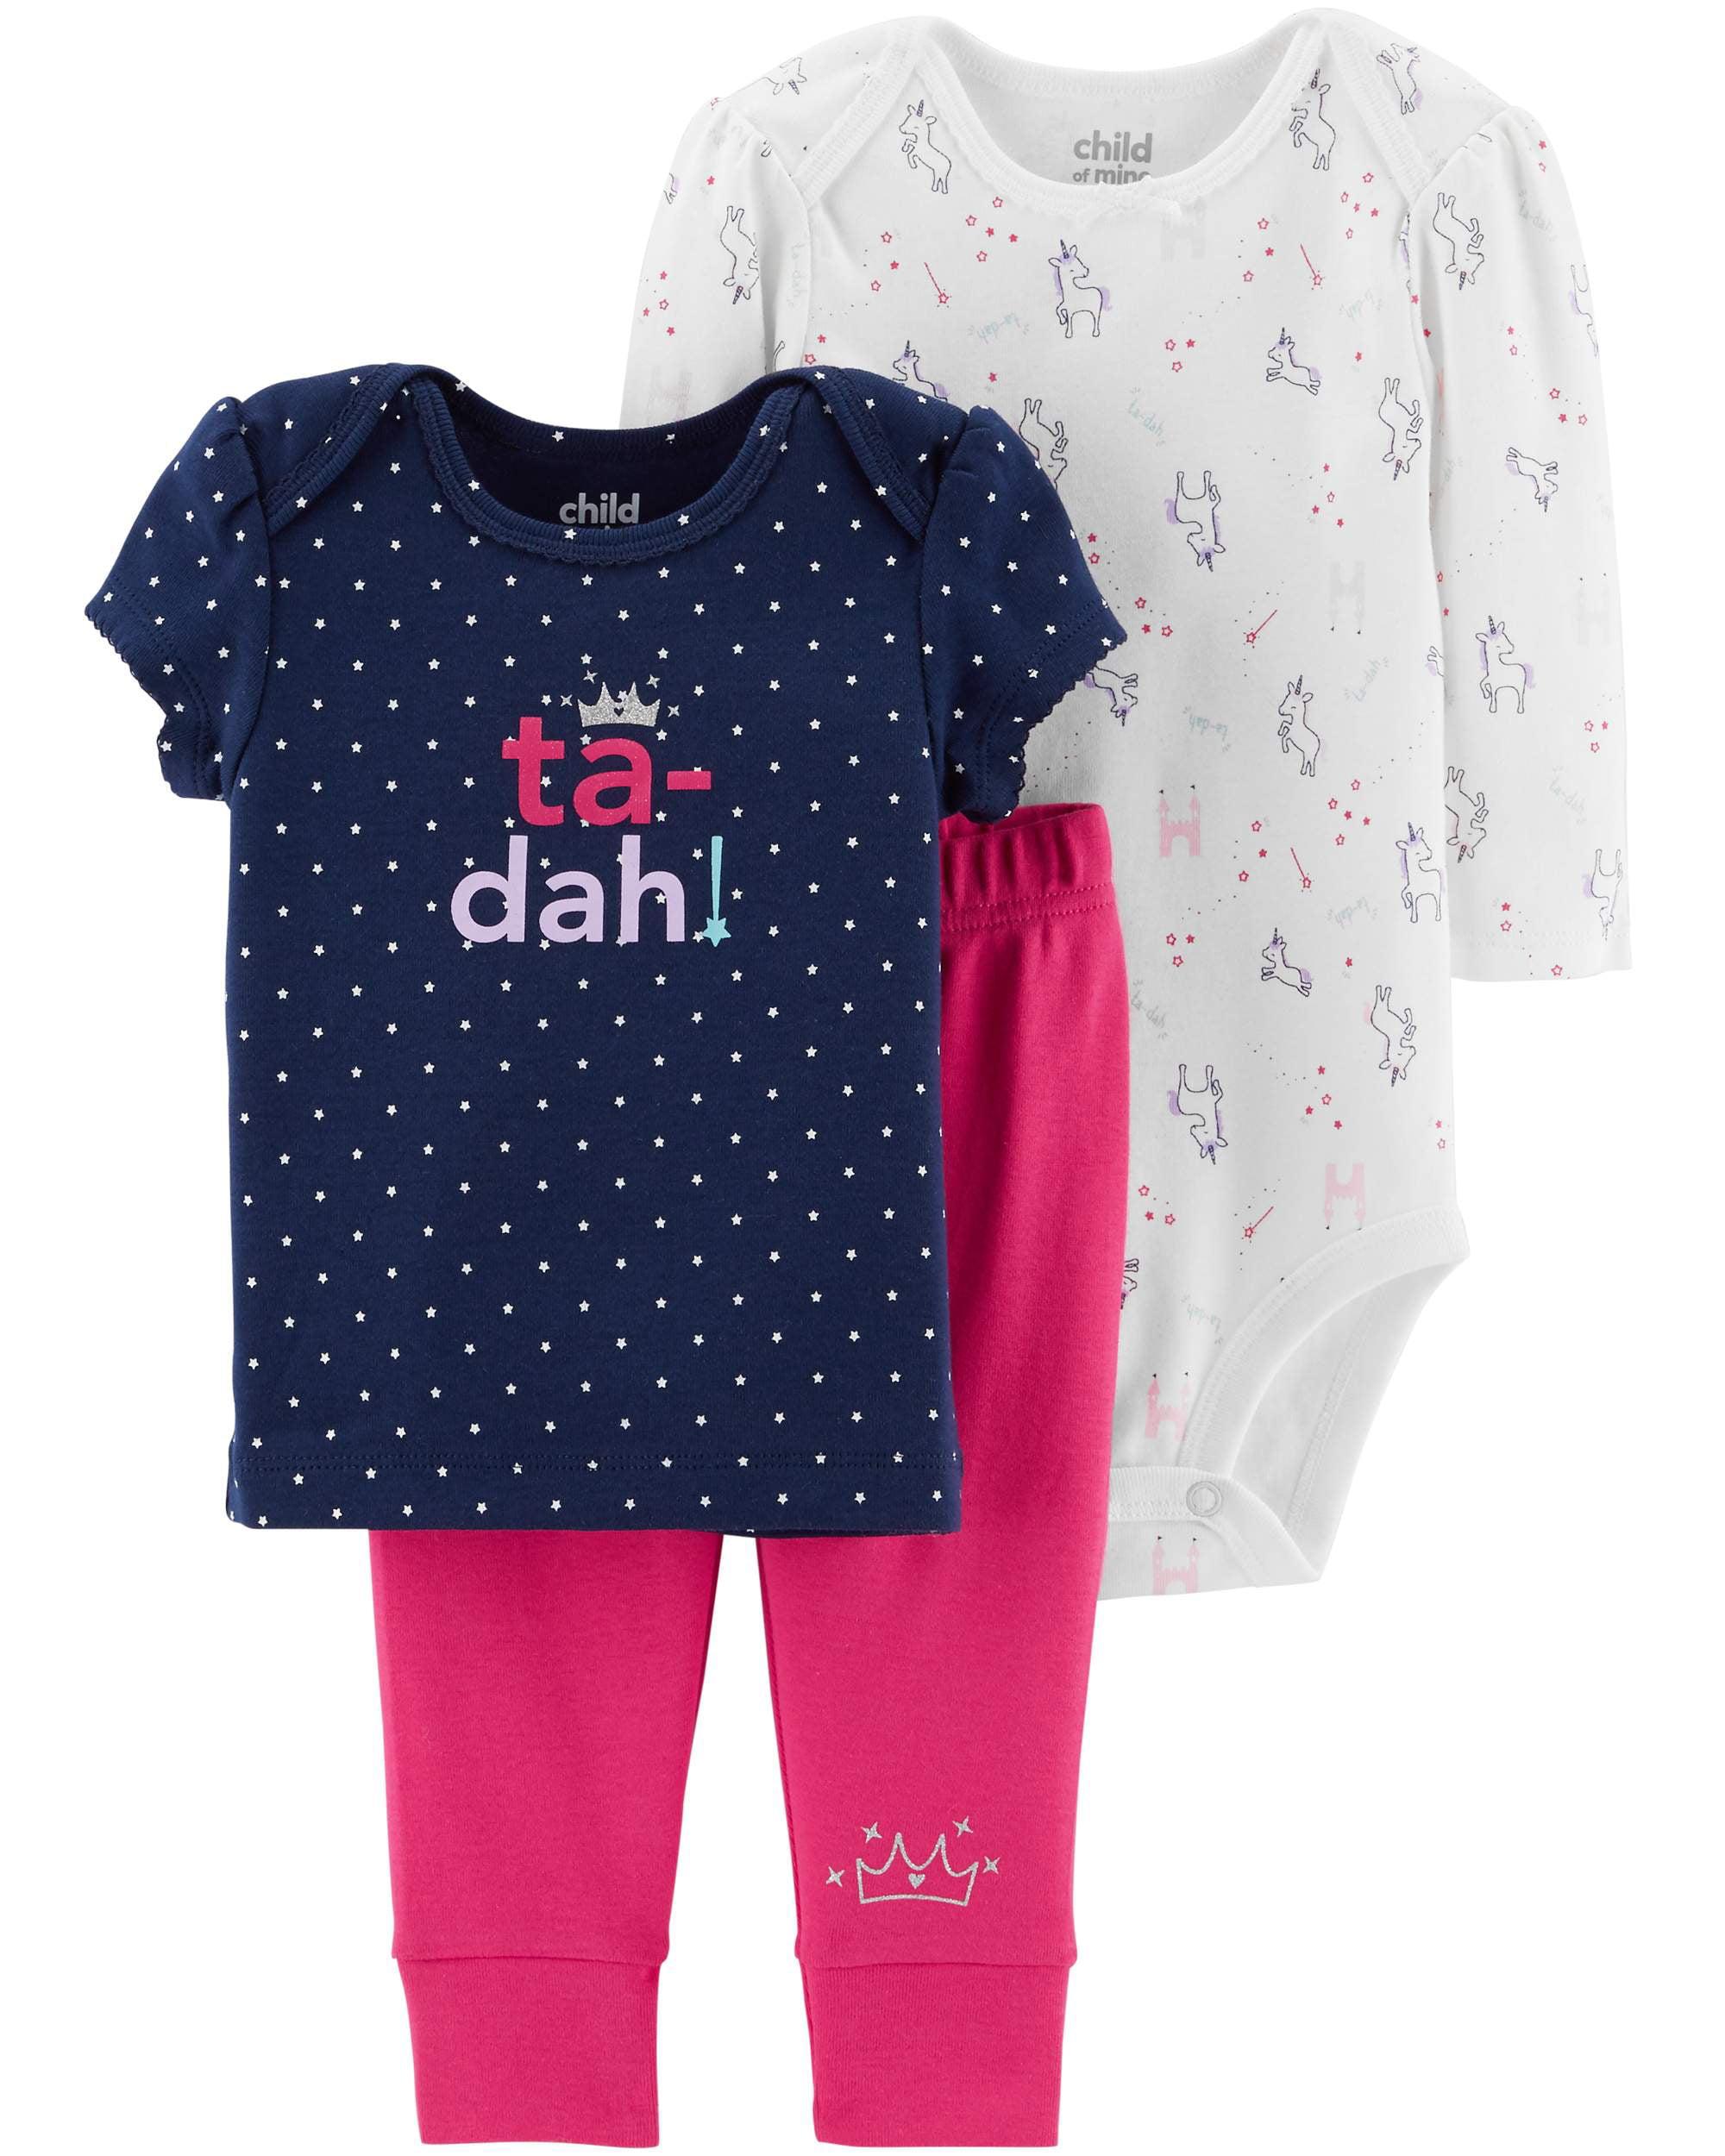 e357f2643 Child Of Mine By Carter's Long Sleeve Bodysuit, T-Shirt & Pants, 3pc ...